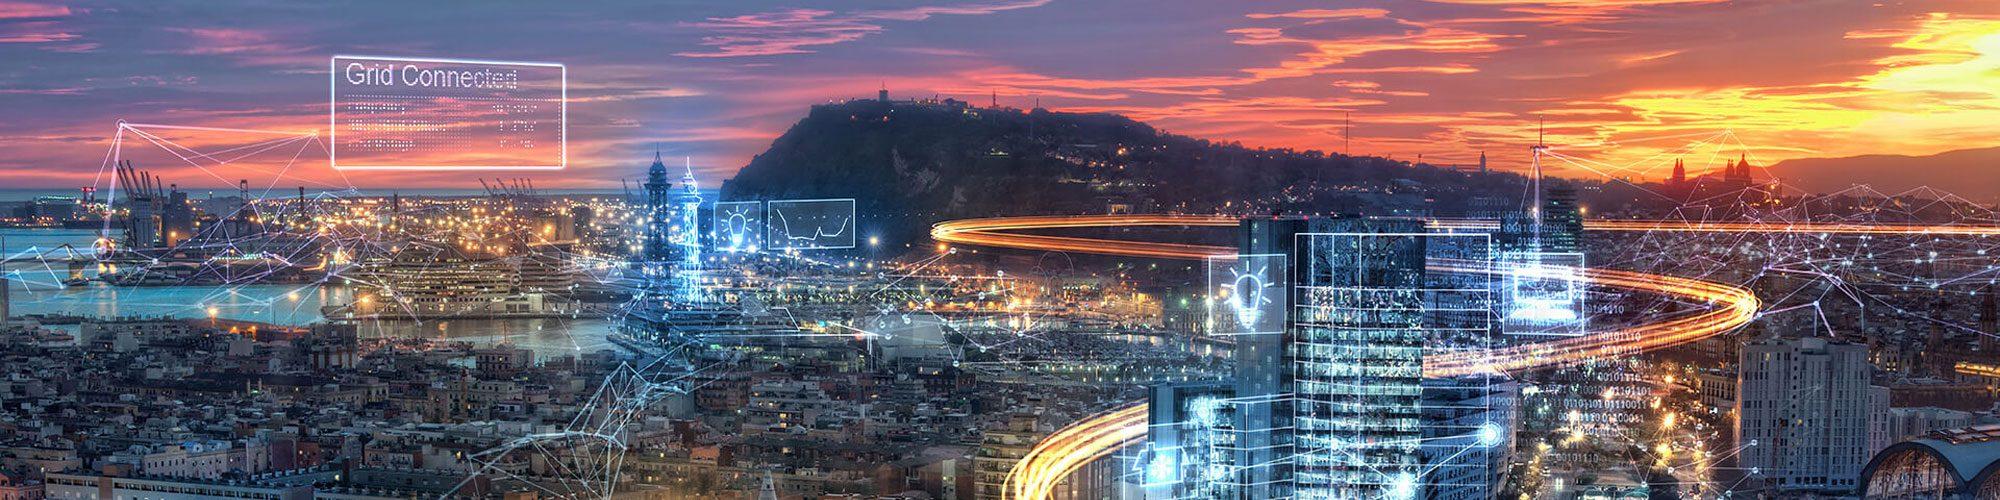 Digital graphics running through a city skyline.